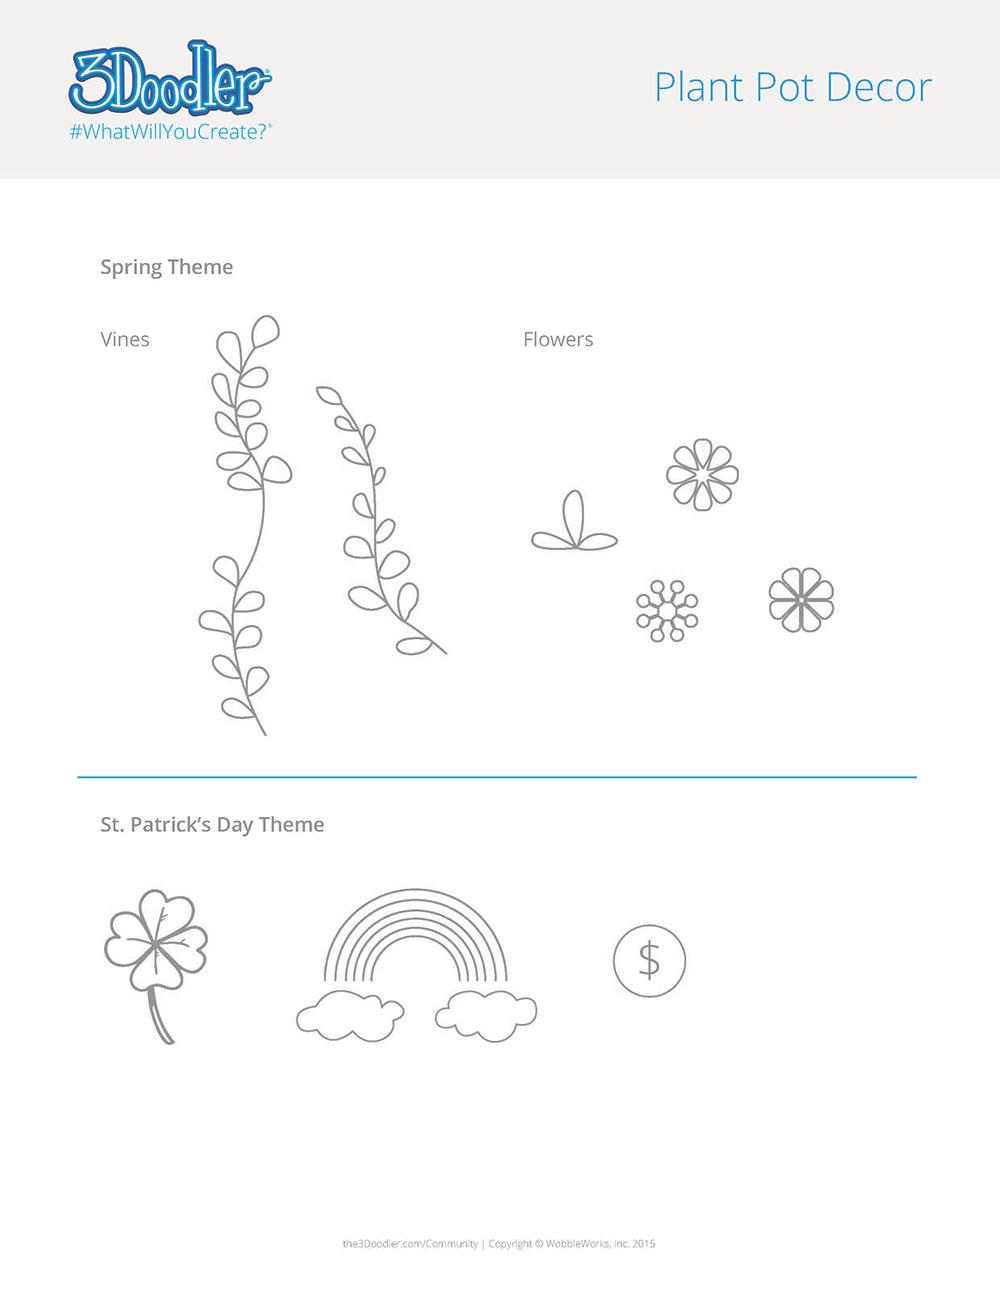 3D Pen Stencil Template Planter Decor